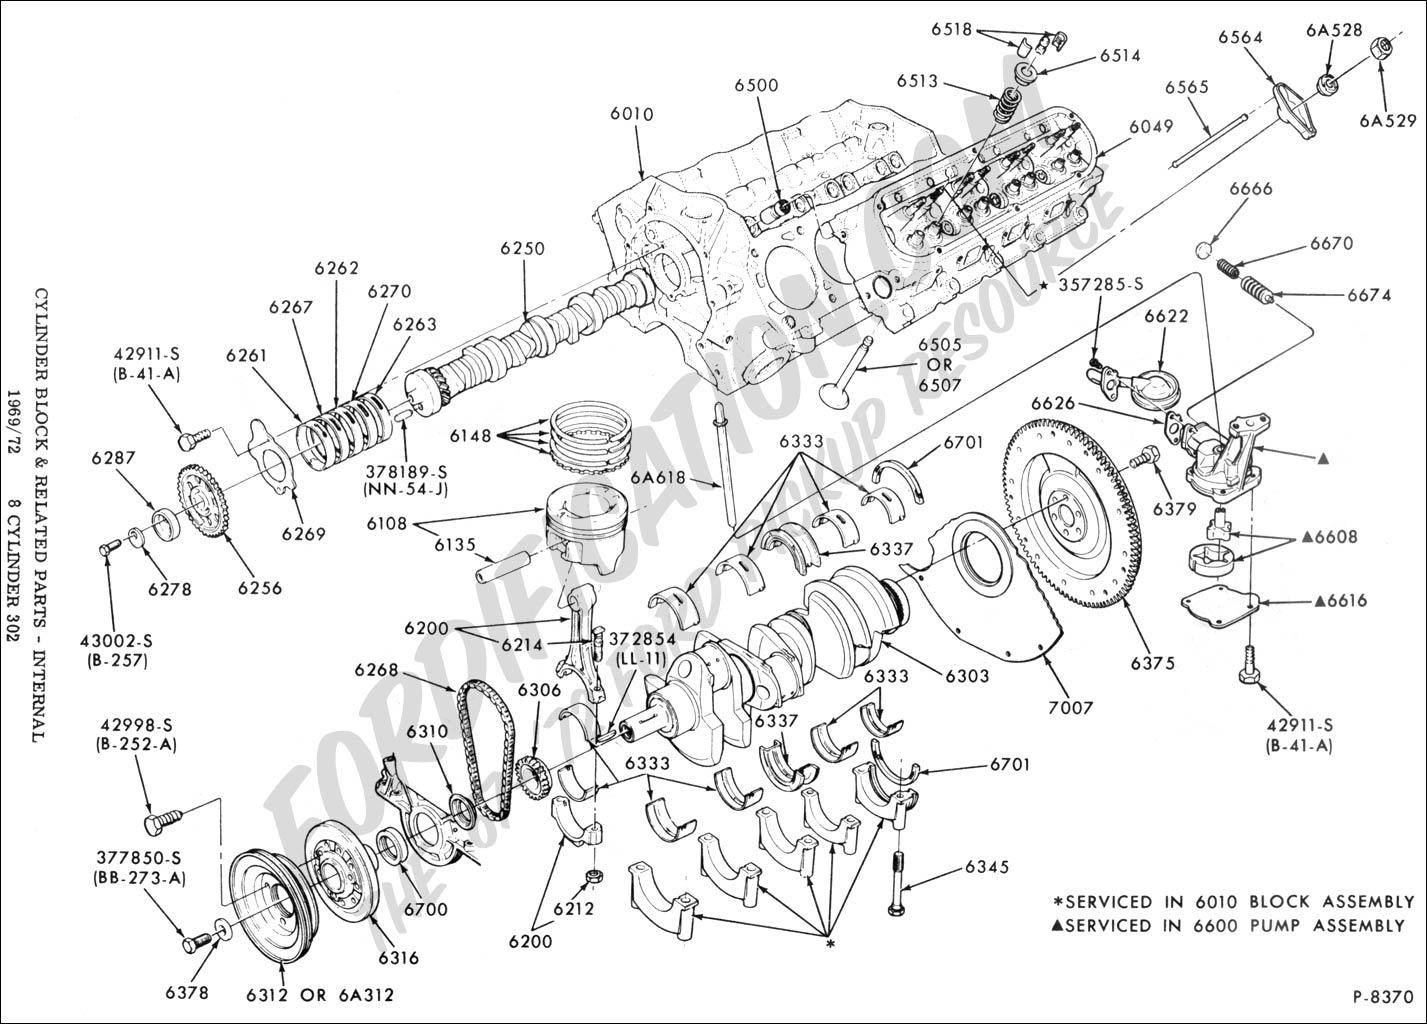 Fiat Engine Schematics Jtd Diagram Wiring Diagrams Chrysler C Fuse Box Trailer 500 Location